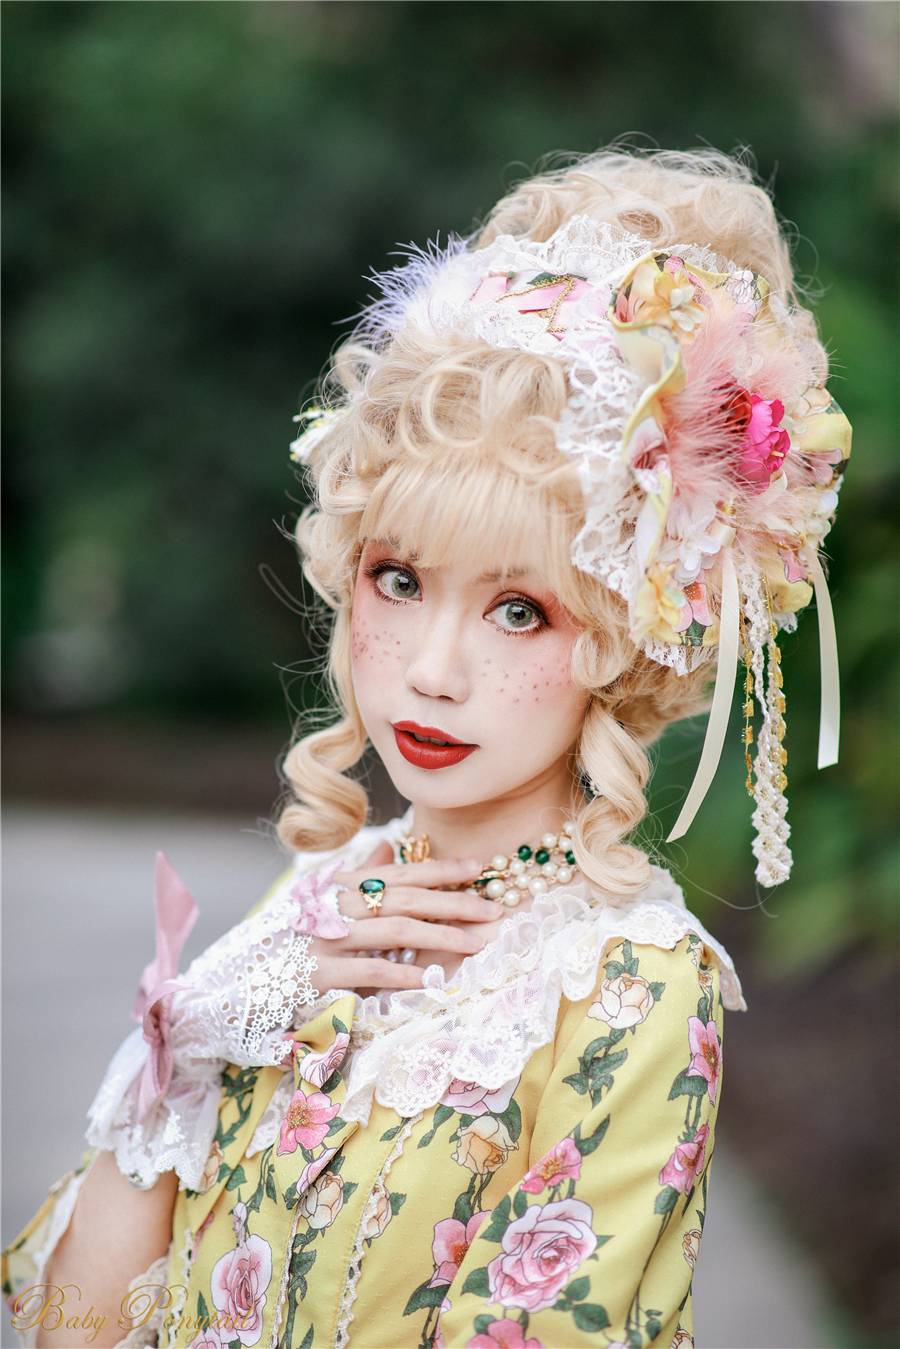 Baby Ponytail_Model Photo_Polly's Garden of Dreams_OP Yellow_Kaka_14.jpg